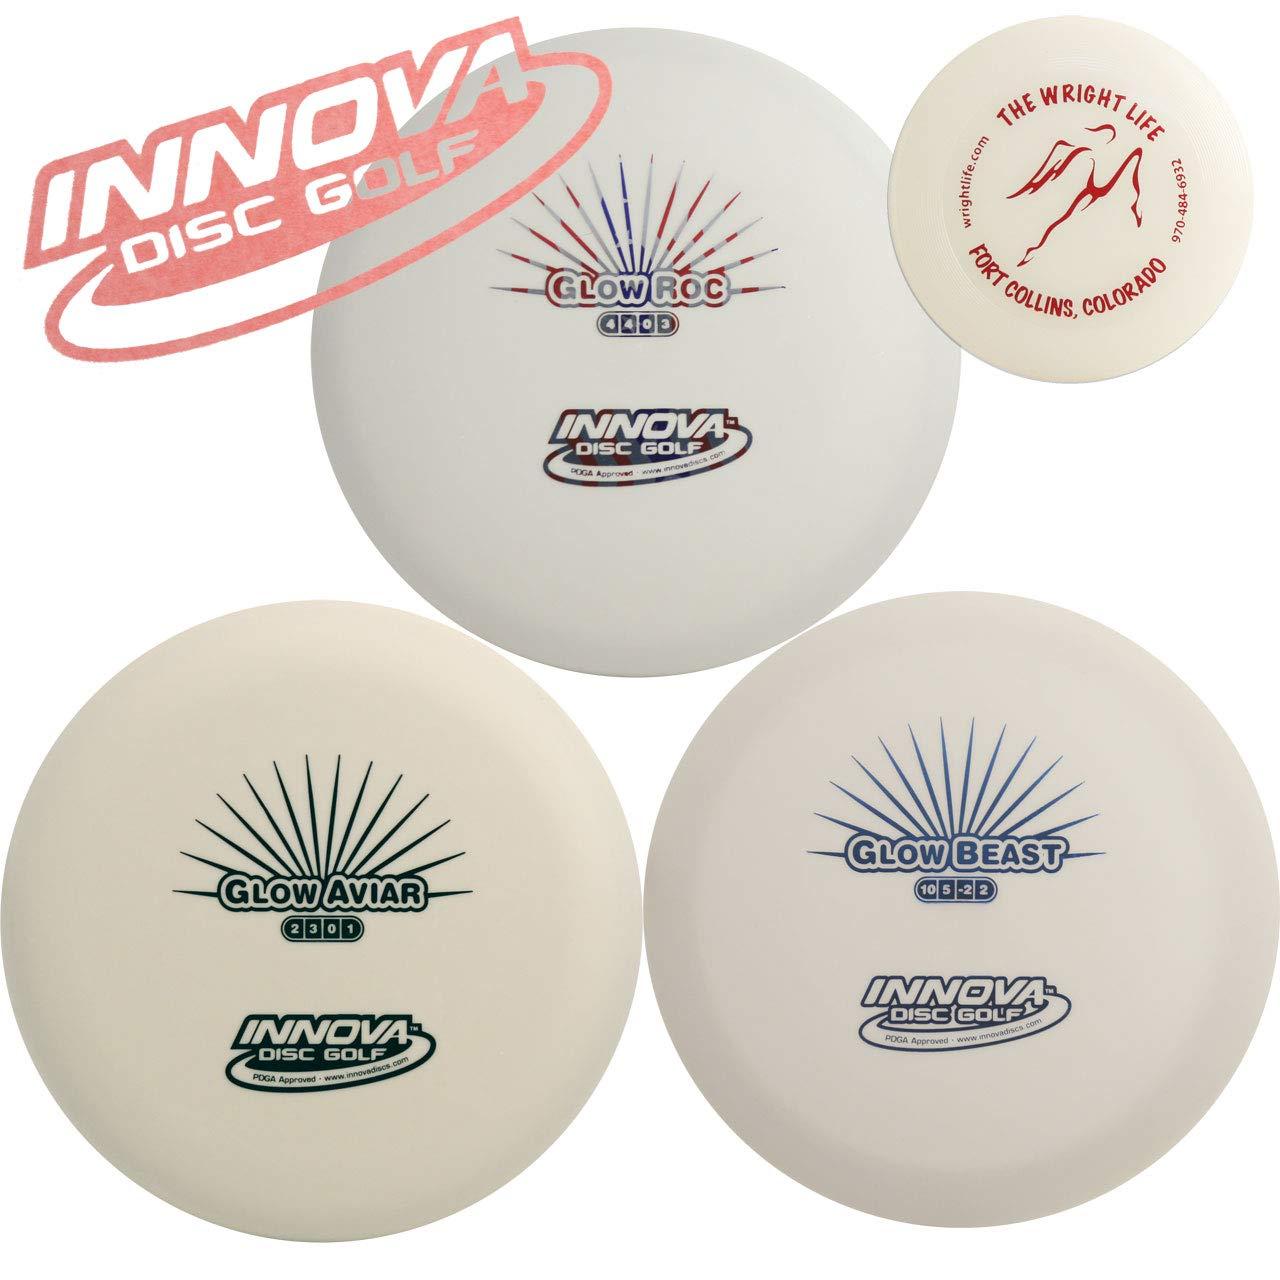 Innova Glow Disc Golf Gift Set Bundle - 3 Glowing Discs Pack (Glows in The Dark) + Mini Marker Disc, Sticker by Innova Disc Golf